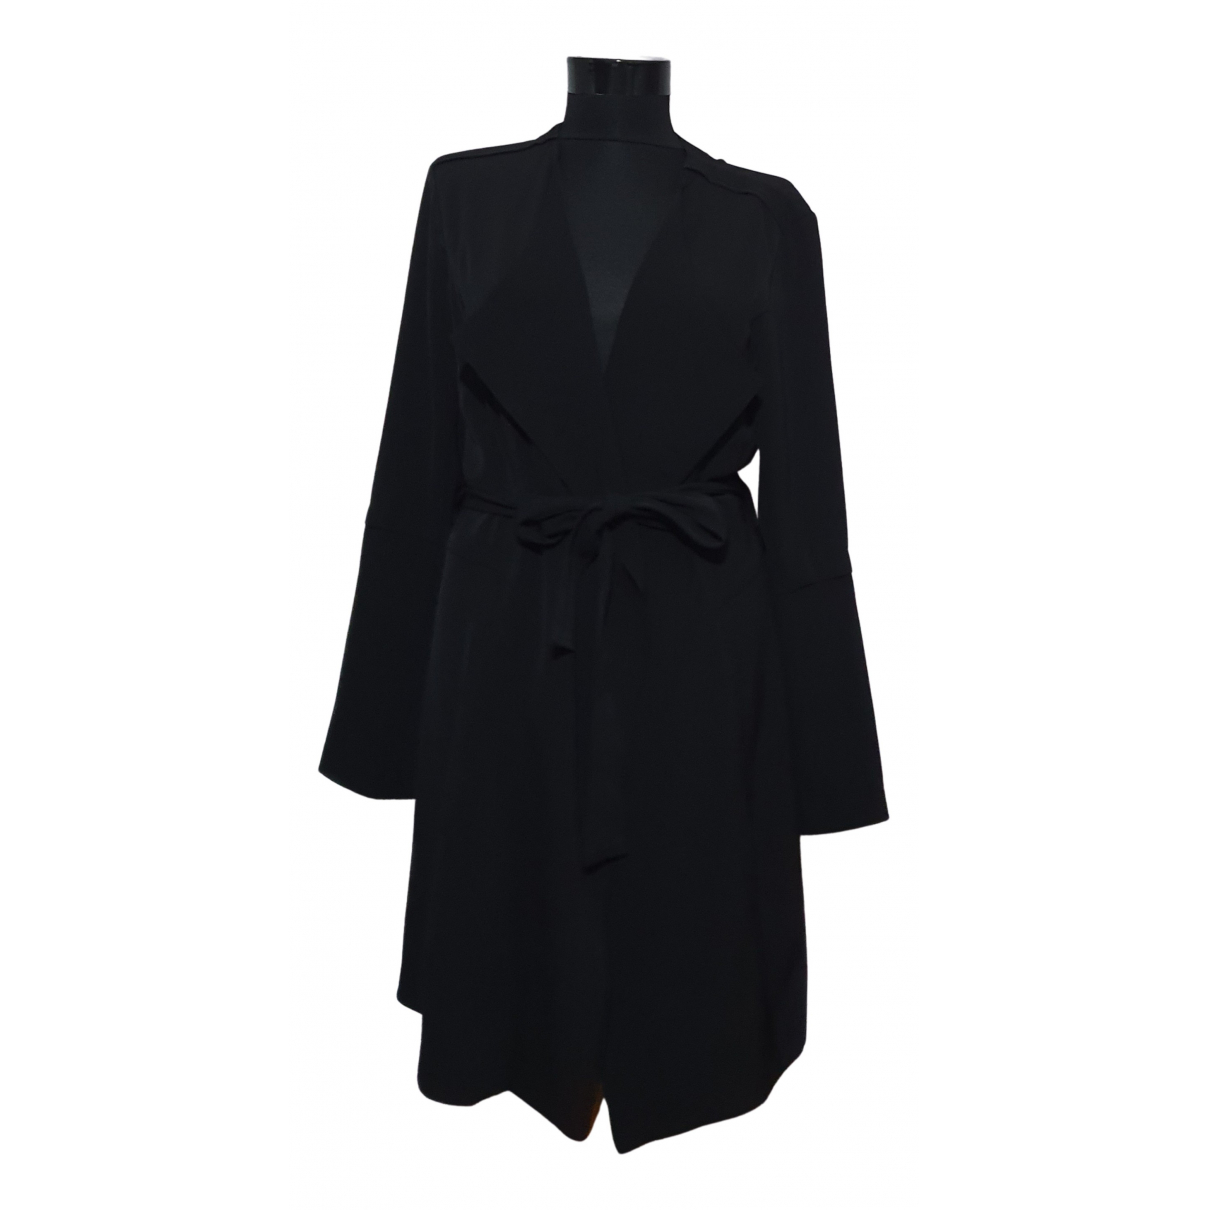 Rachel Zoe N Black Trench coat for Women M International